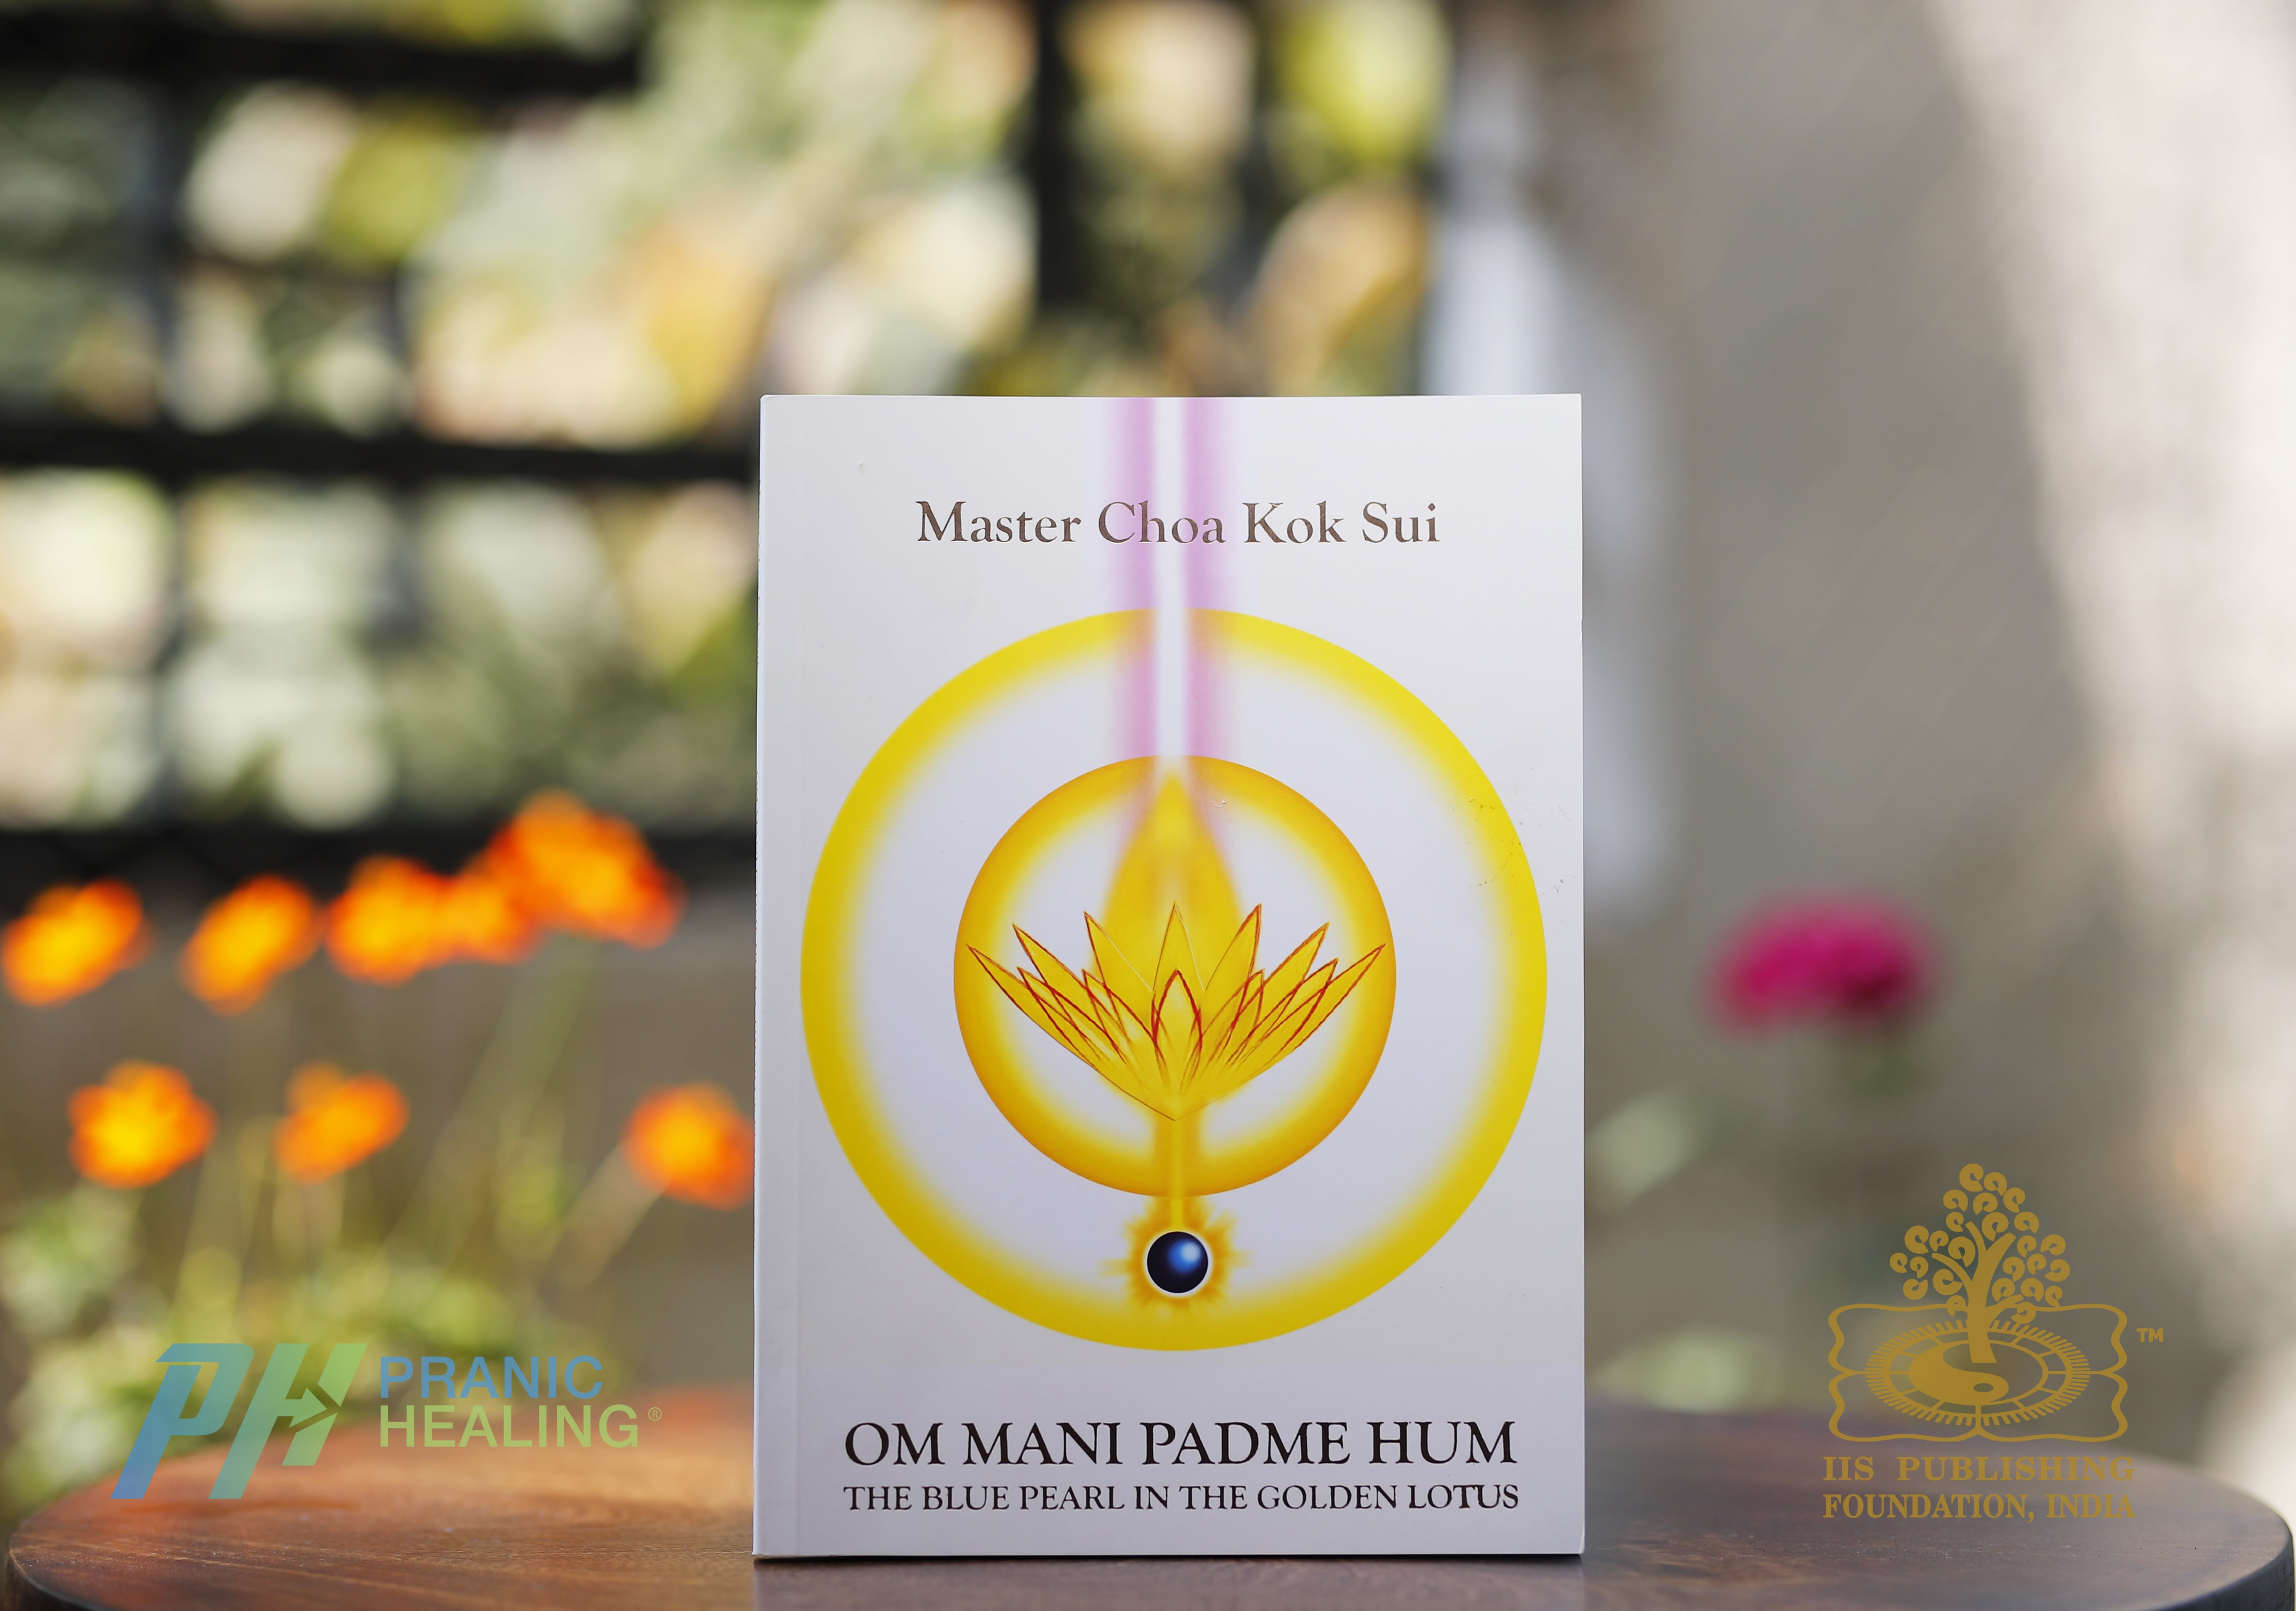 https://shop.pranichealingmumbai.com/products/om-mani-padme-hum-book